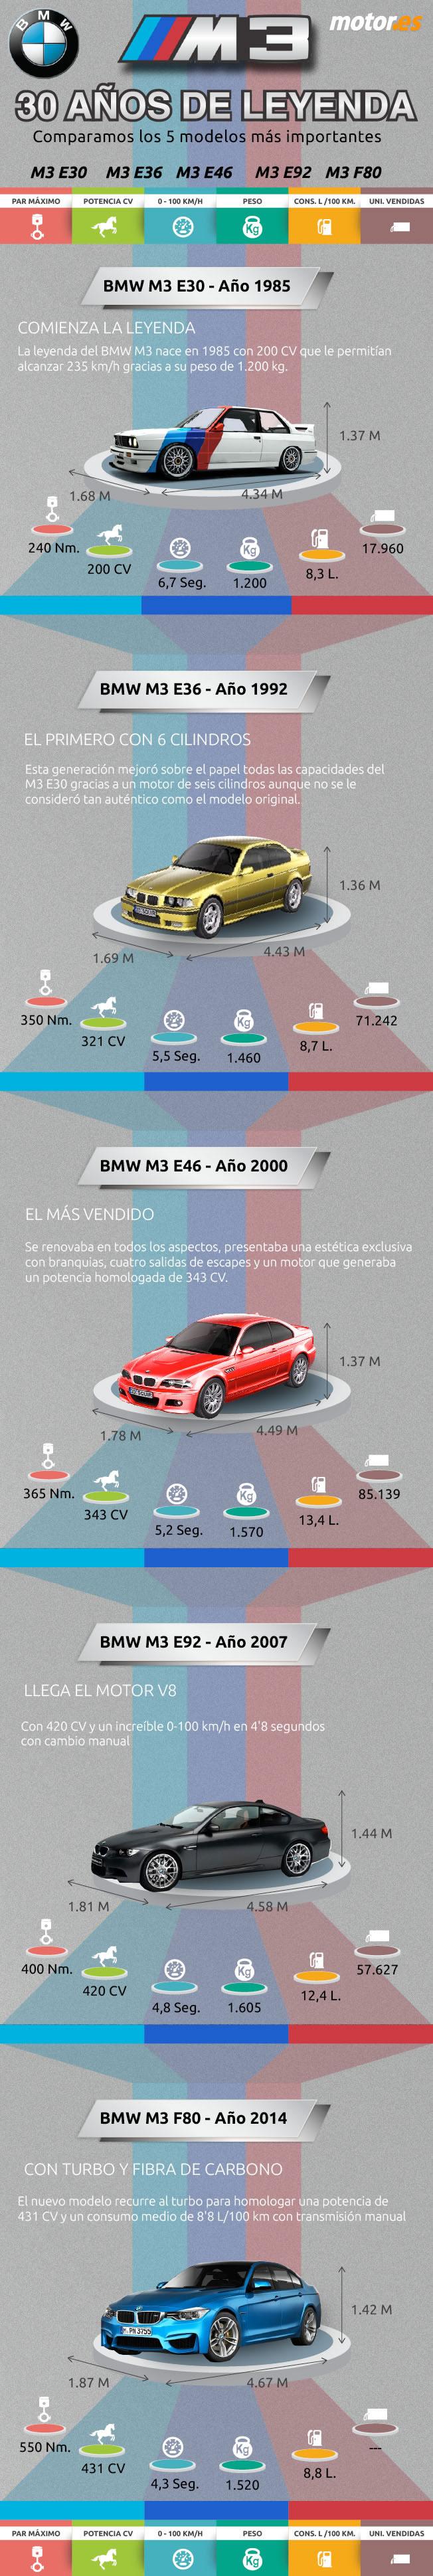 Historia BMW M3